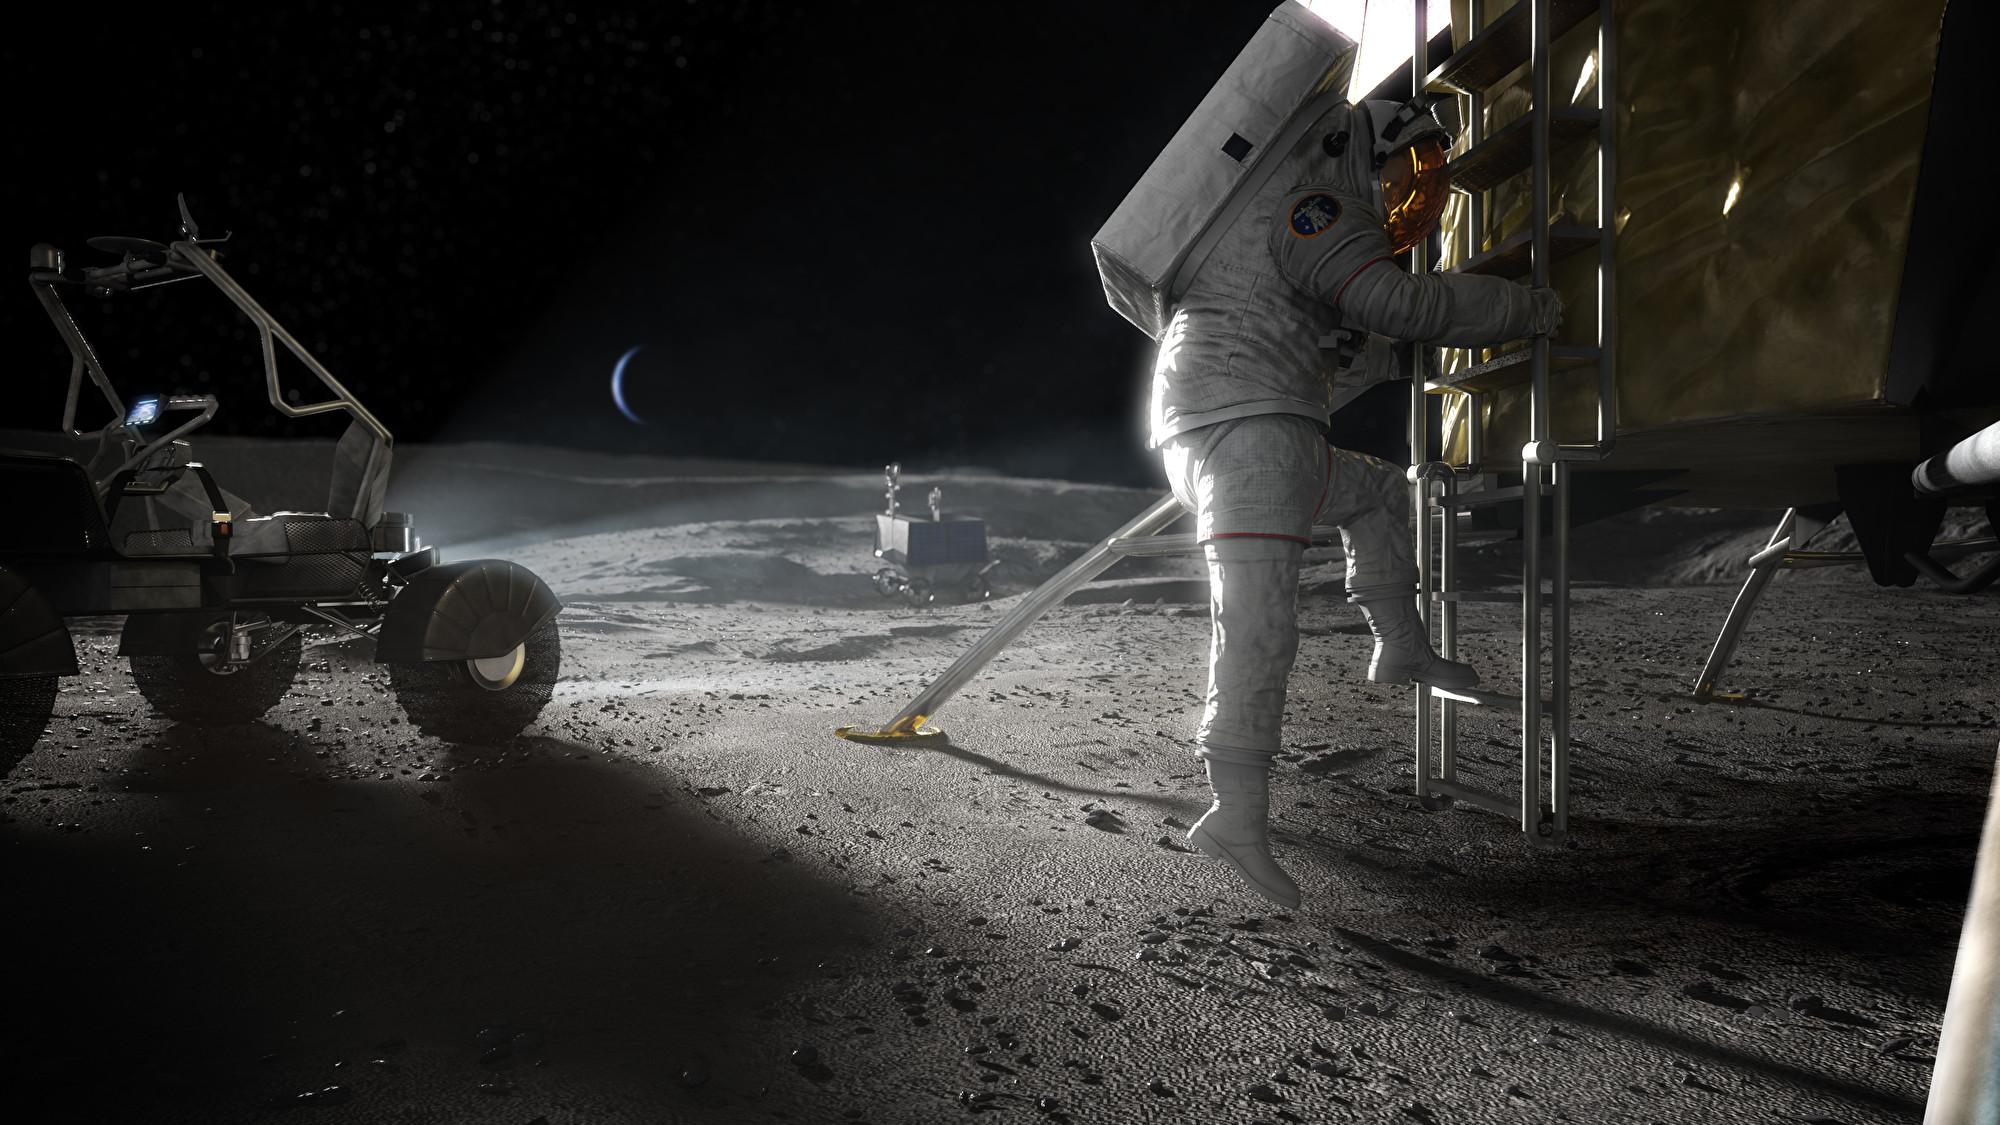 NASA周四(4月30日)宣佈阿蒂蜜絲(Artemis)登月計劃的硬體製造商名單,入選者分別是特斯拉汽車創辦人馬斯克的SpaceX、亞馬遜總裁貝佐斯的Blue Origin以及擅長無人機技術的 Dynetics。(NASA)